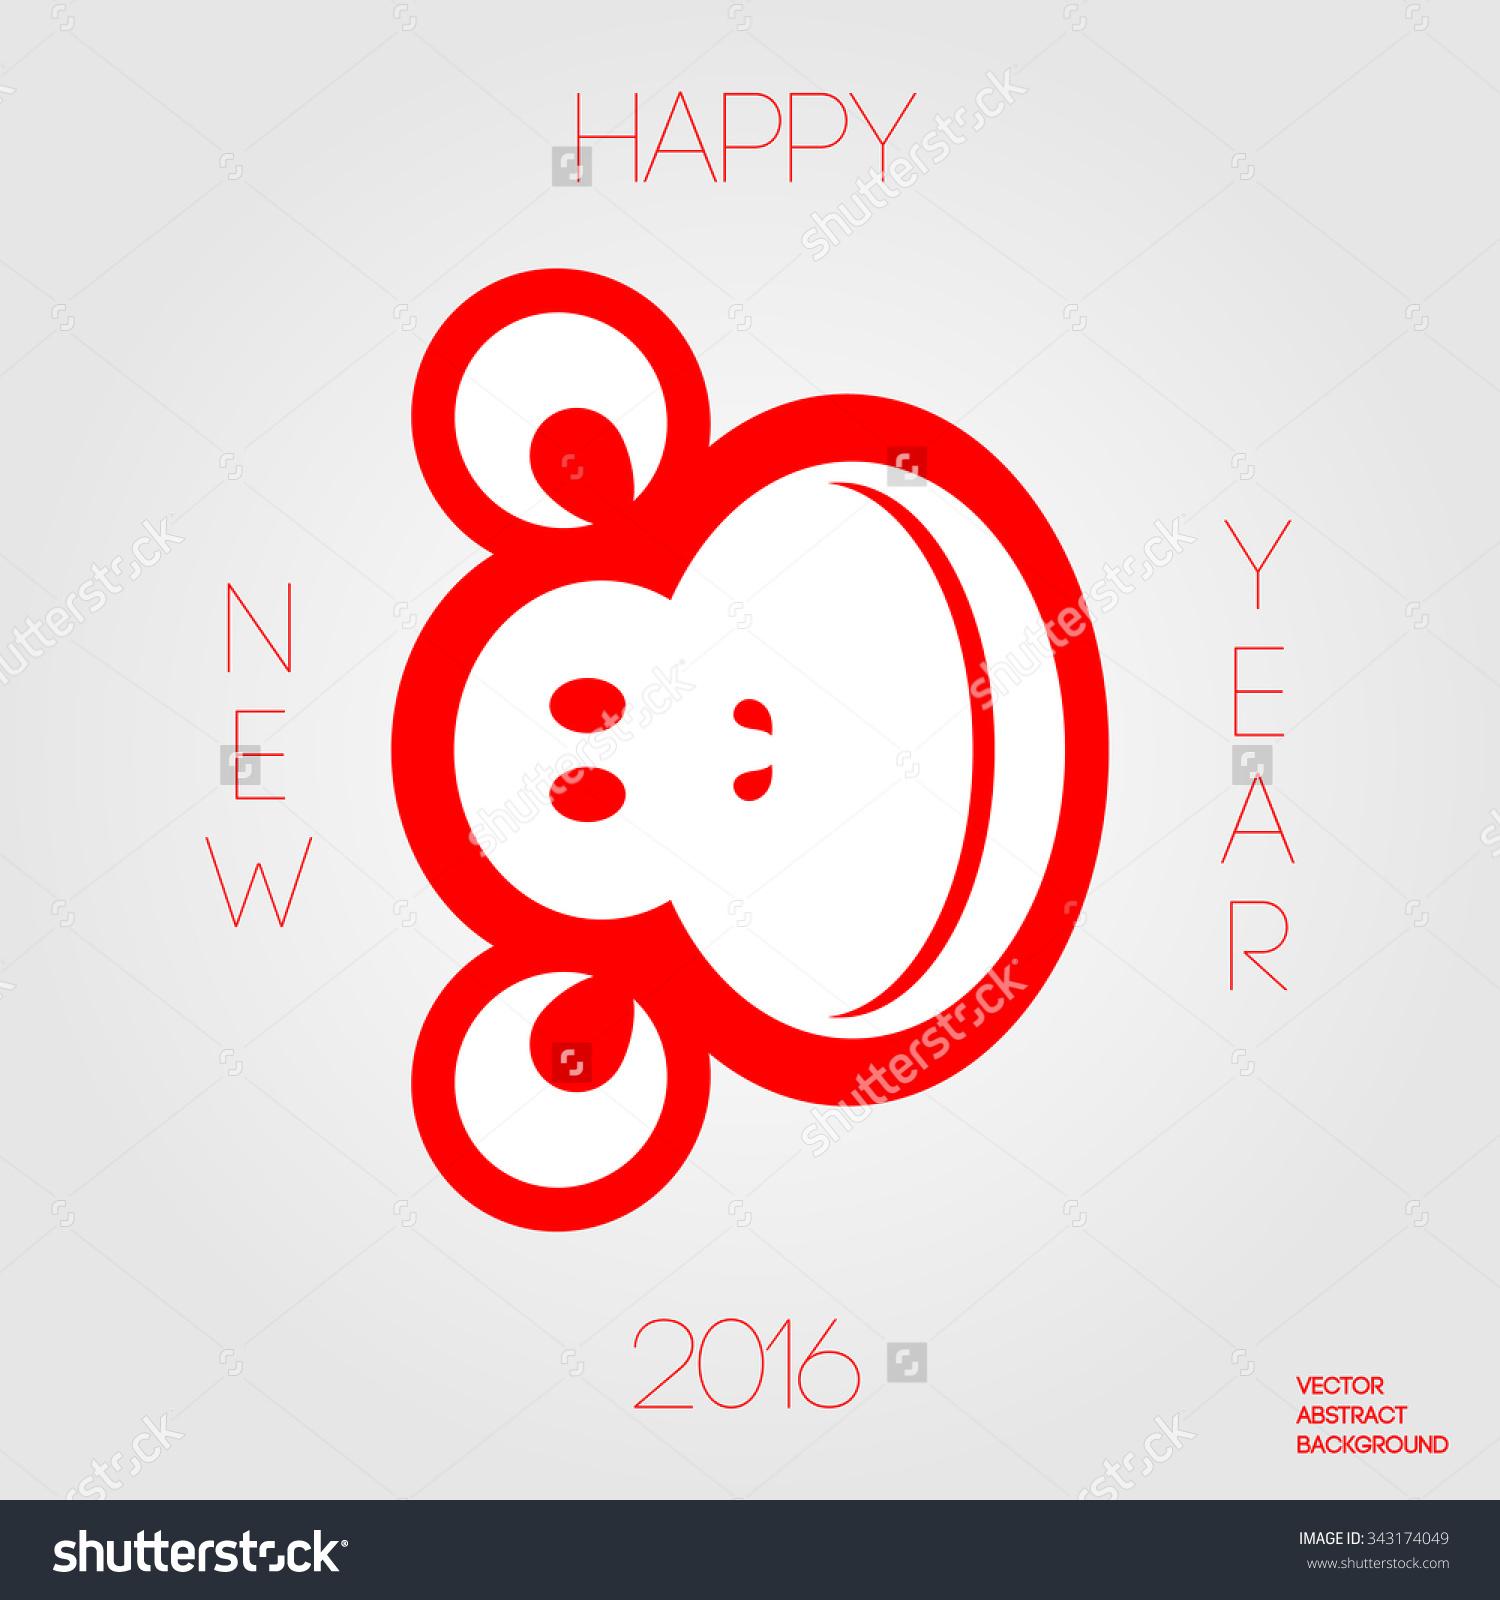 Monkey clipart icon new year clipart royalty free library Monkey Face Icon Monkey Symbol 2016 Stock Vector 343174049 ... clipart royalty free library